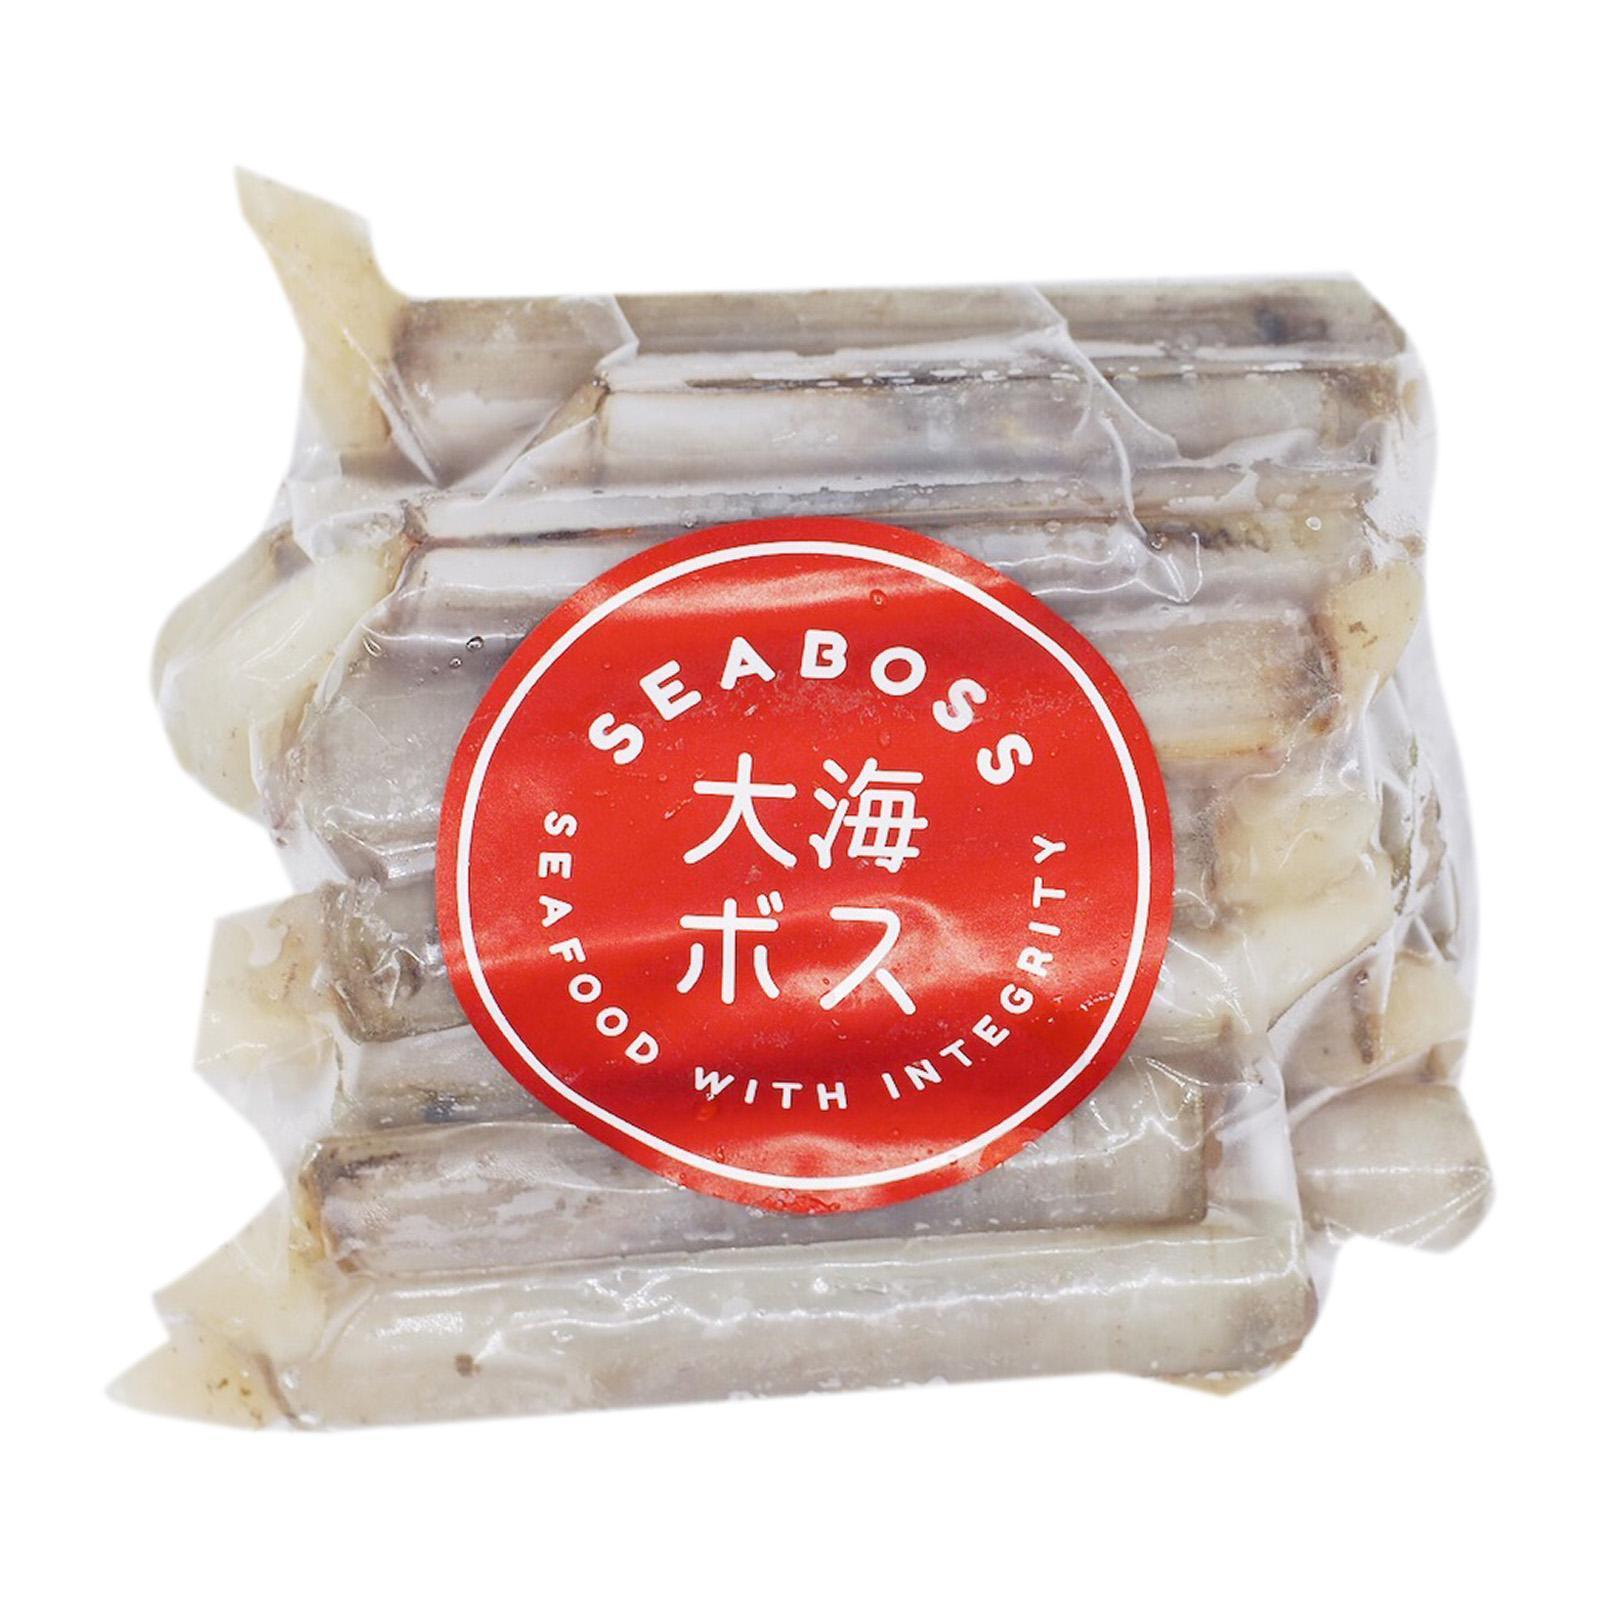 SEABOSS Bamboo Clams - Frozen